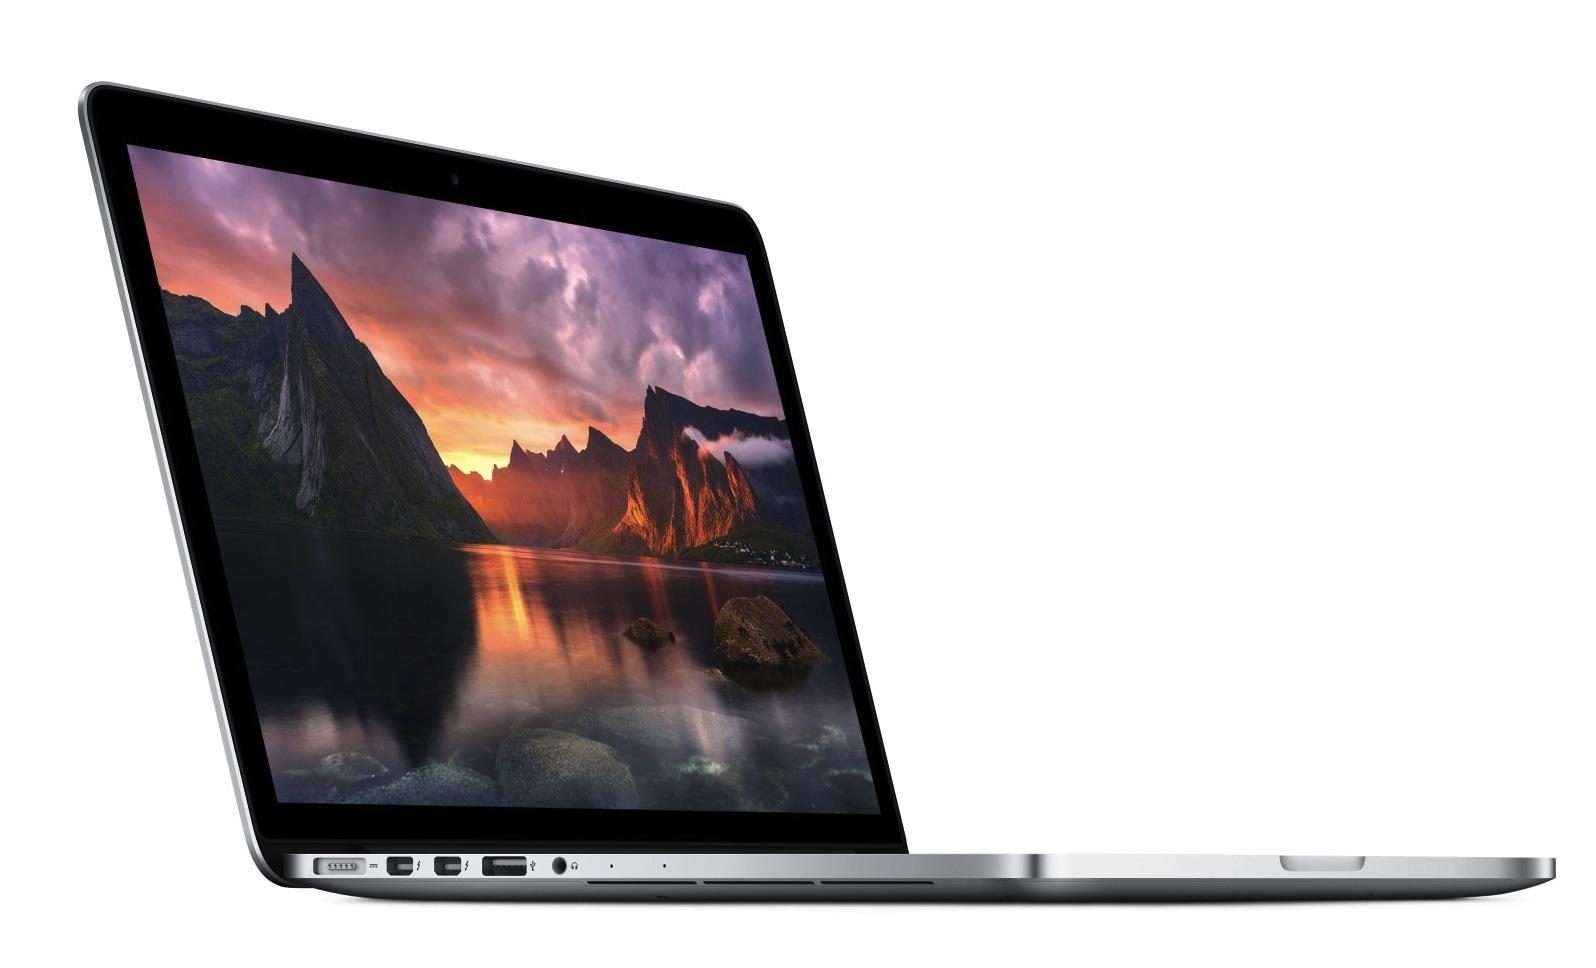 Apple MacBook Pro 2013 Lineup Announced